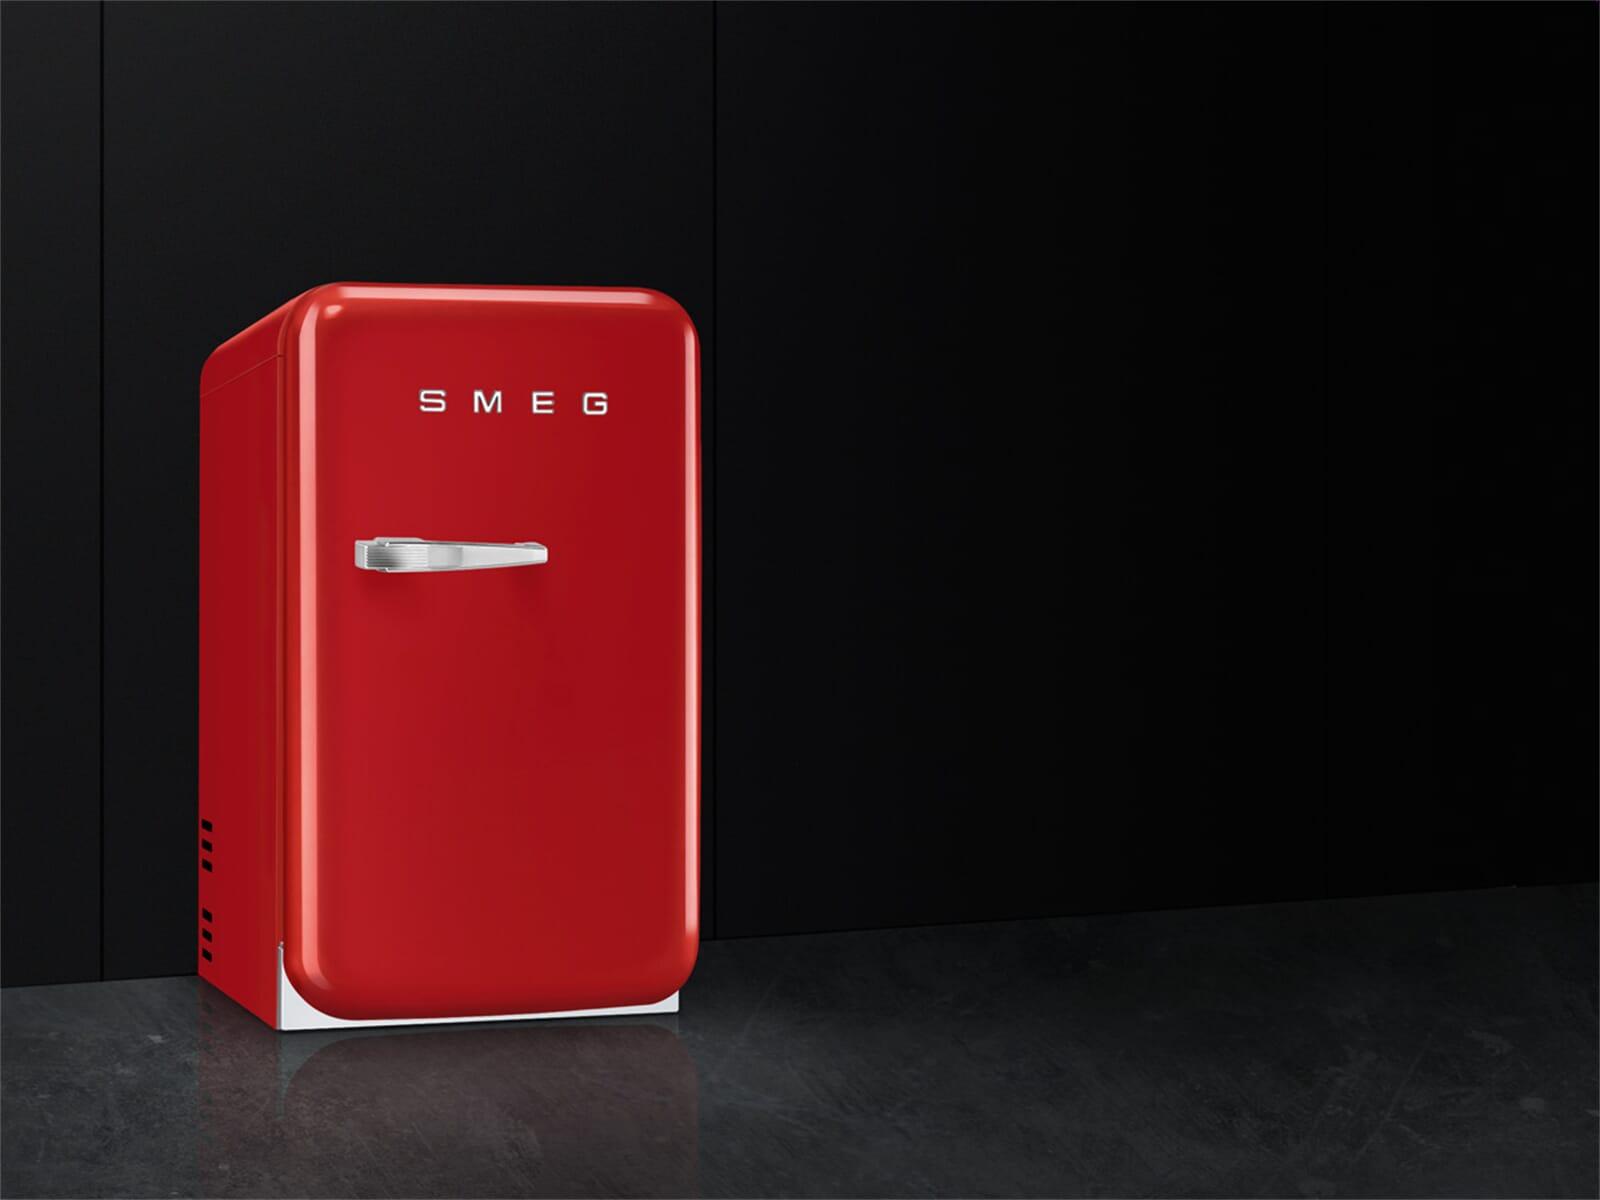 Smeg Kühlschrank Chocolate : Kühlschrank rot magnetfolie din a zum beschriften und